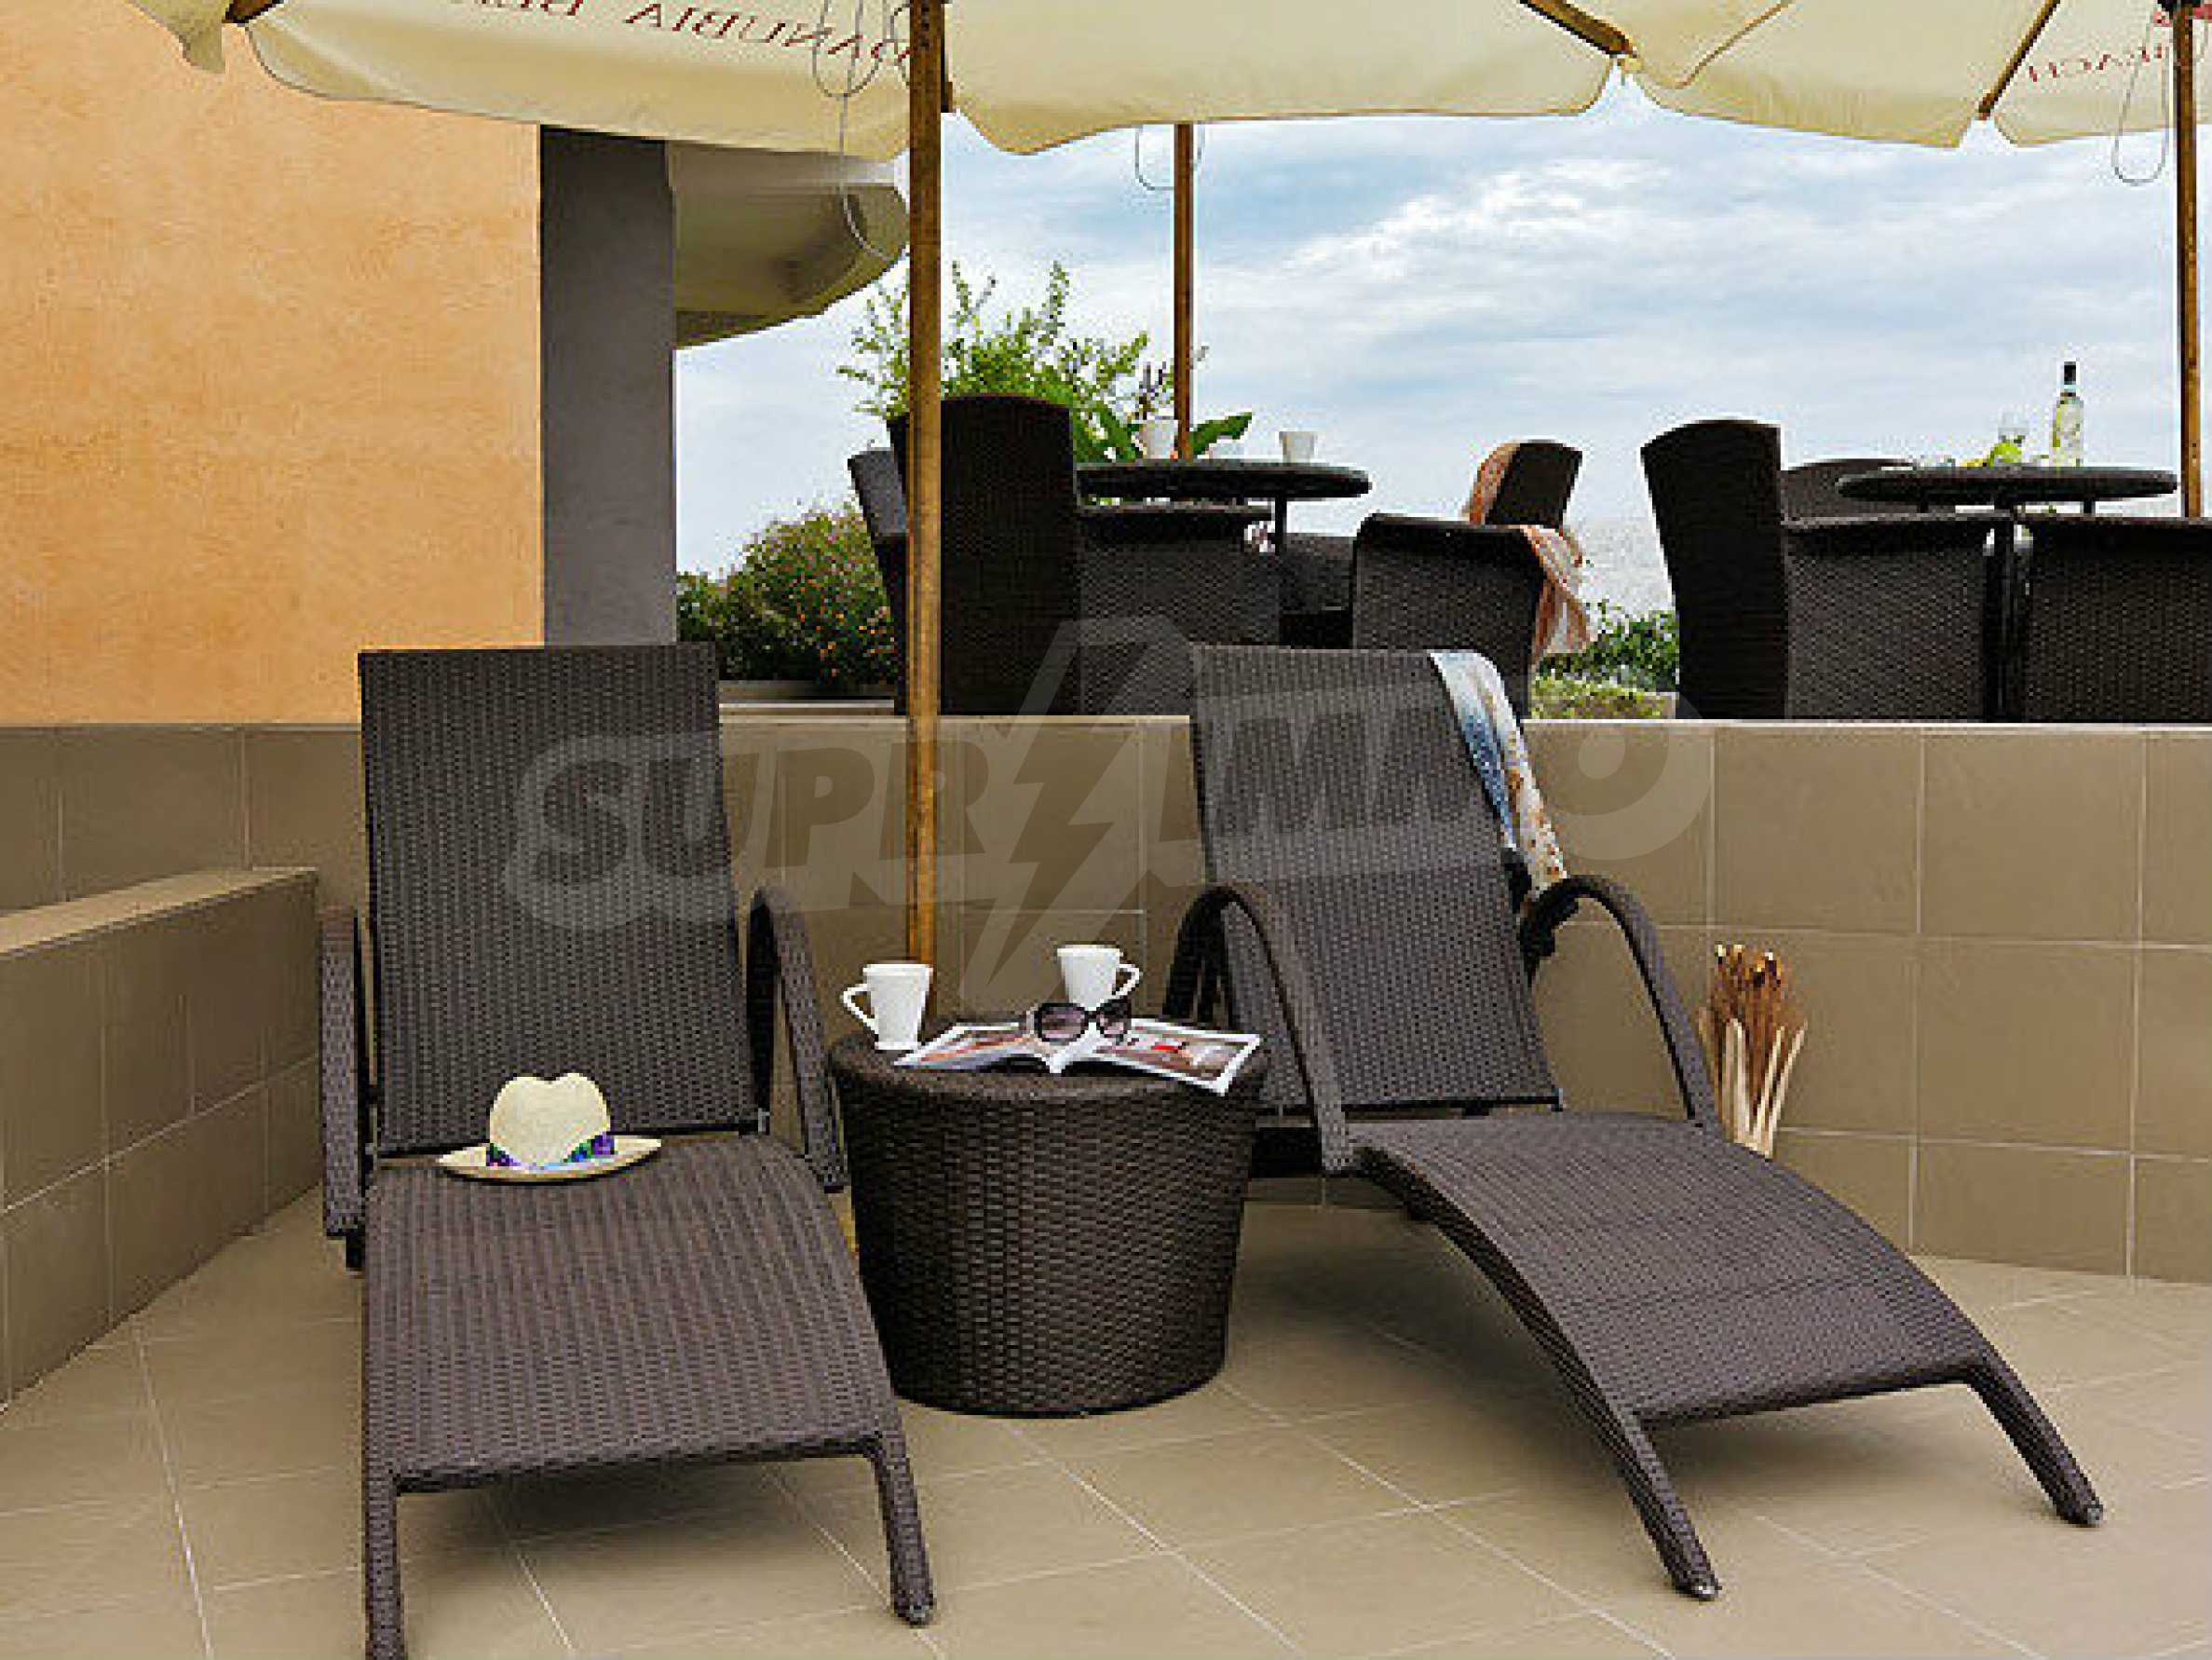 Coffee-bar with kitchen in Danubia Beach near Vidin and the Danube 17